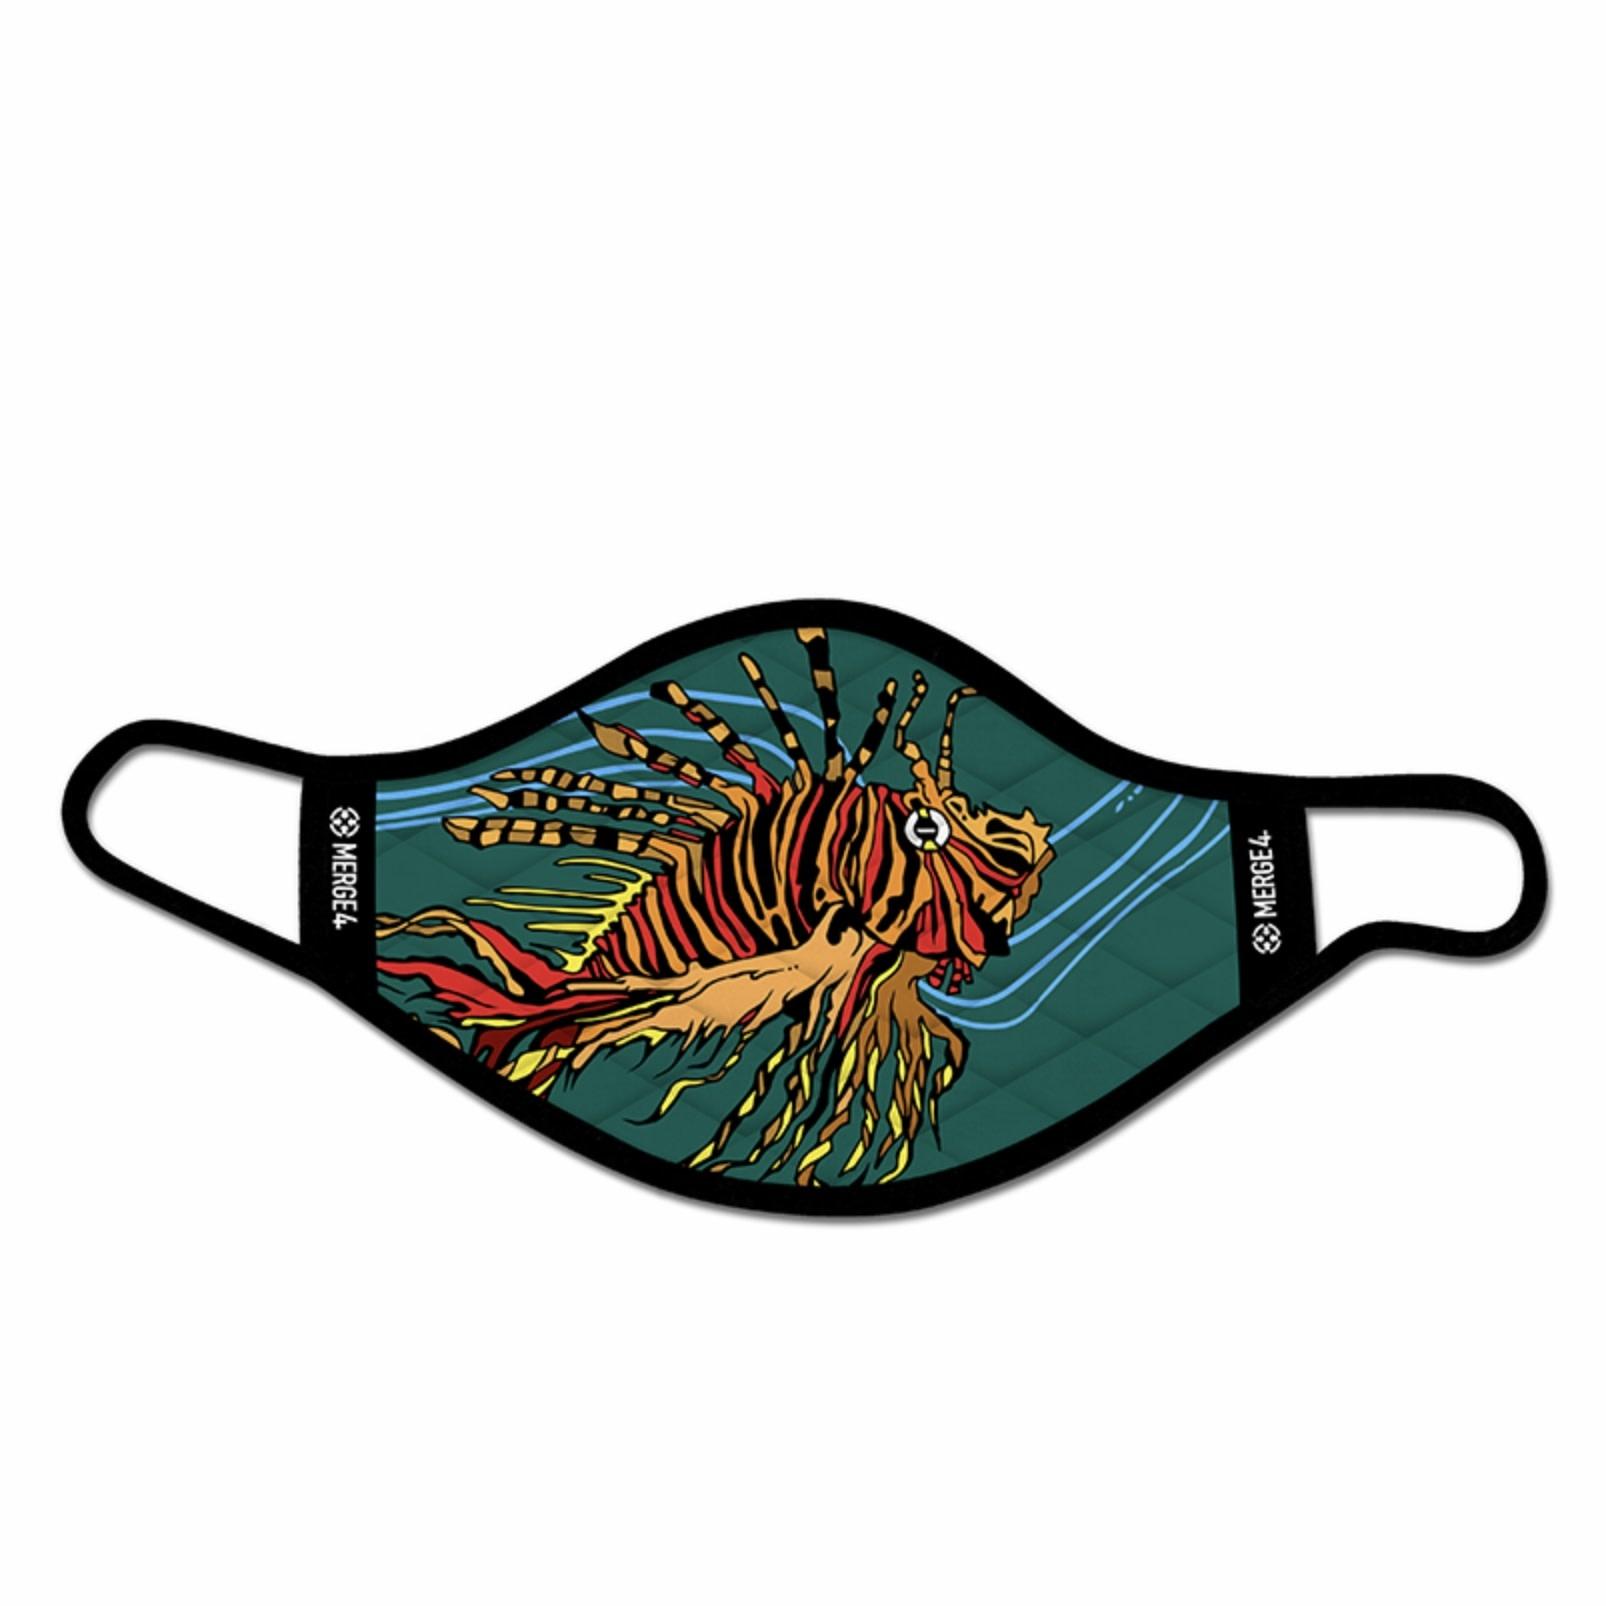 Merge 4 Merge 4 -Taylor Lion Fish Mask